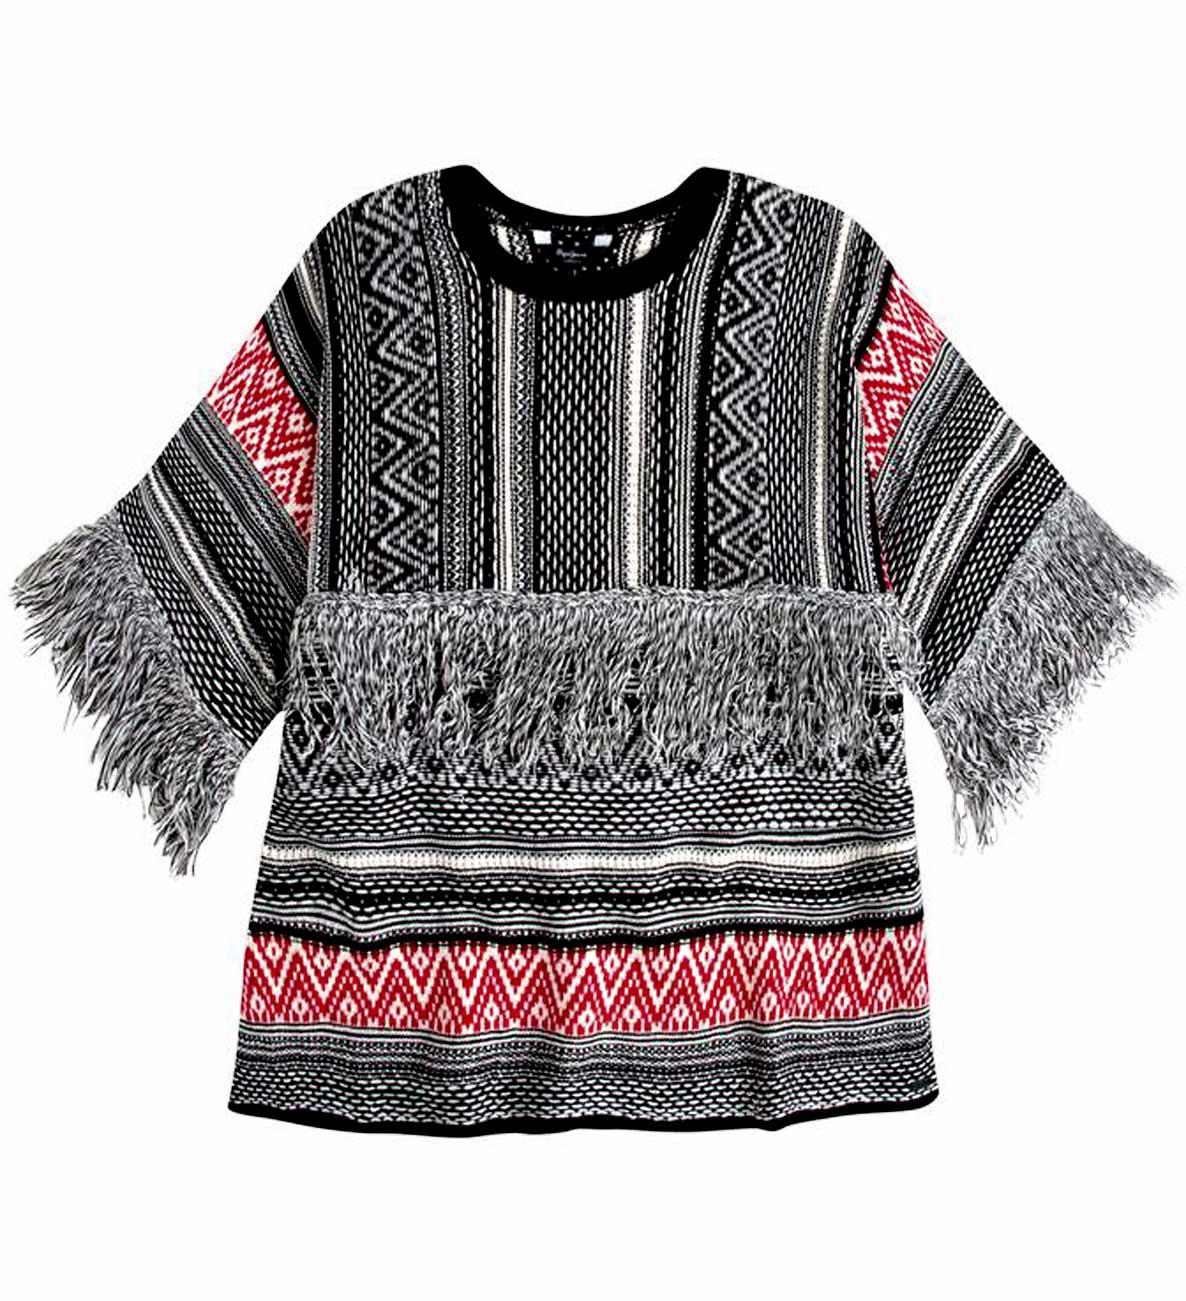 545b2518e0a Dámský svetr s třásněmi PEPE JEANS